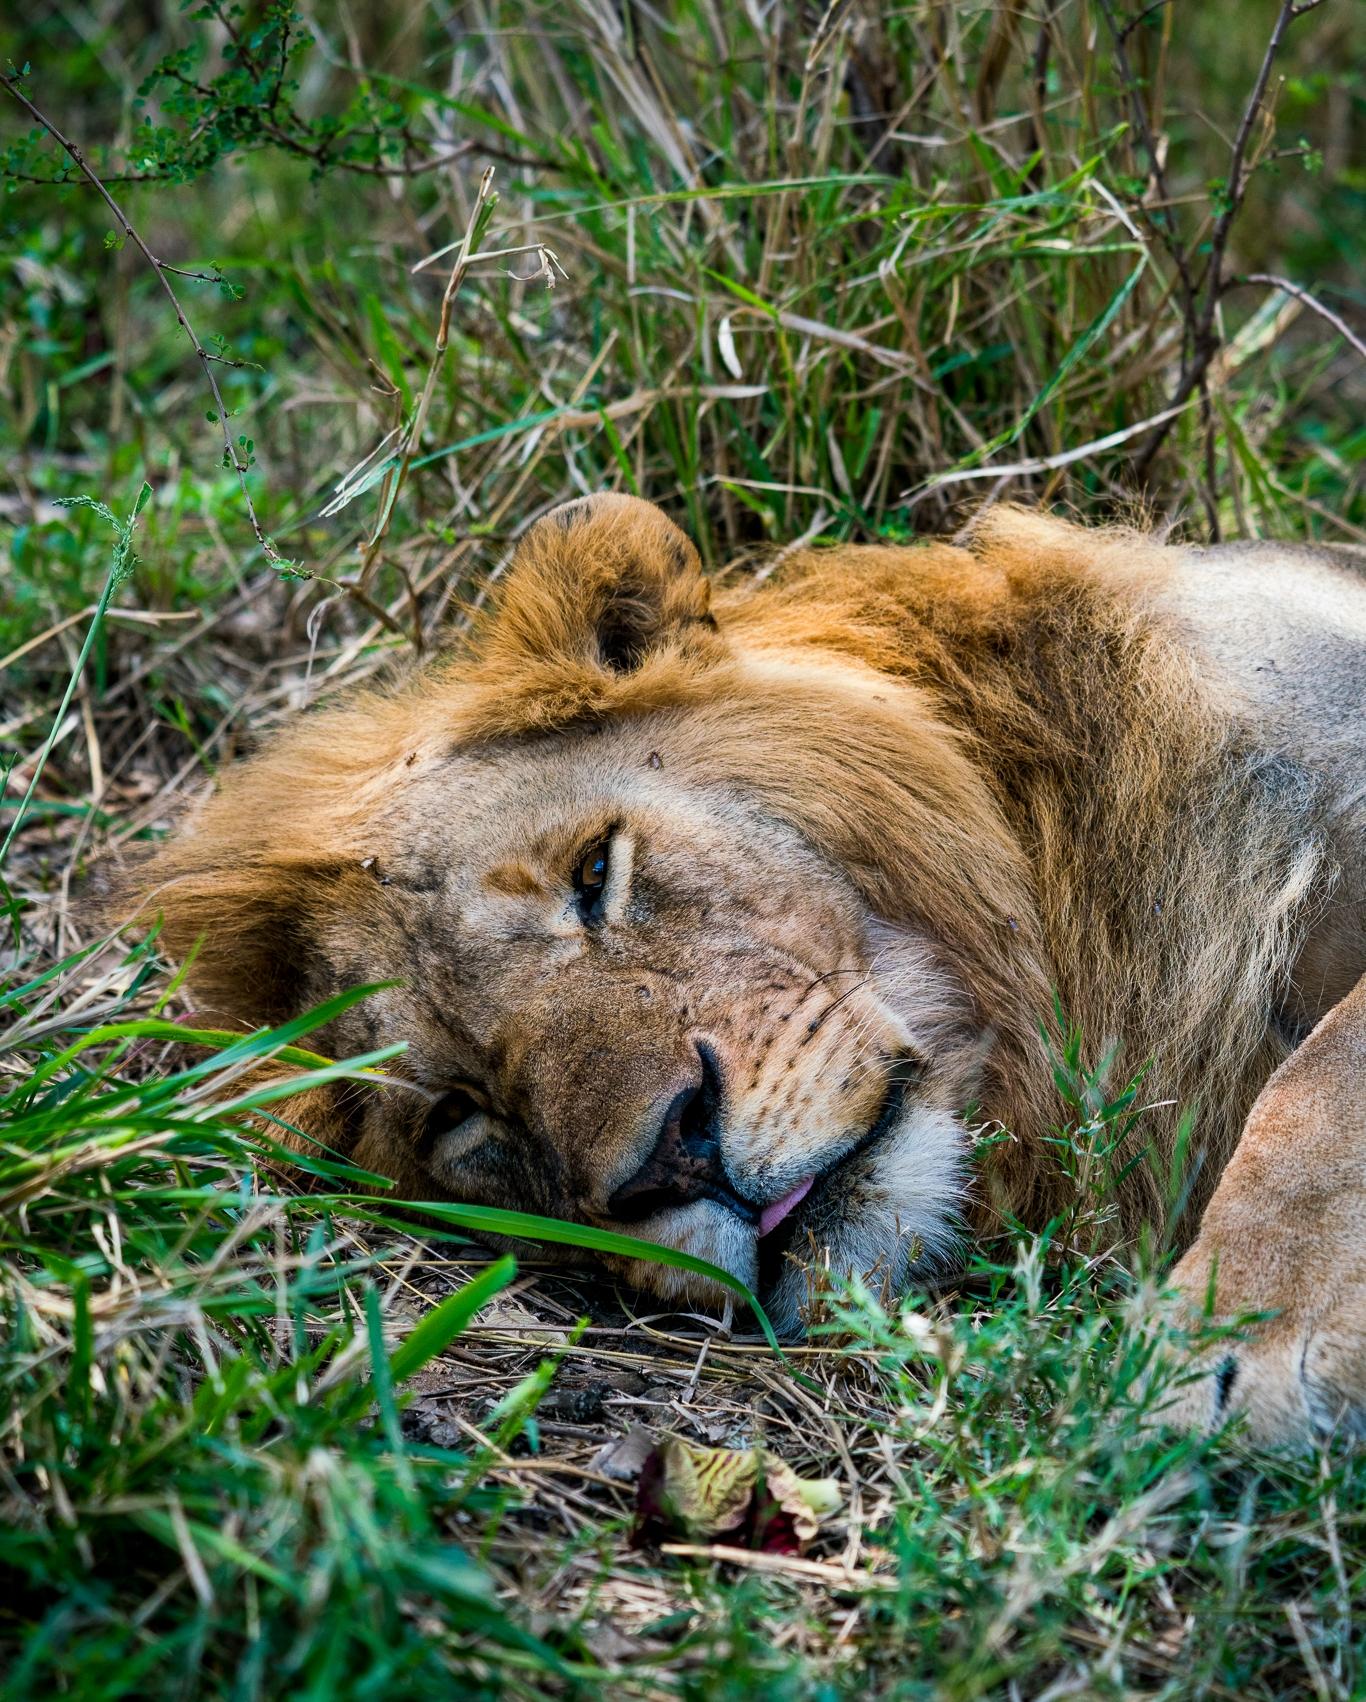 Male Lion resting in Maasai Mara - Kin Travel Ph. Dave Krugman